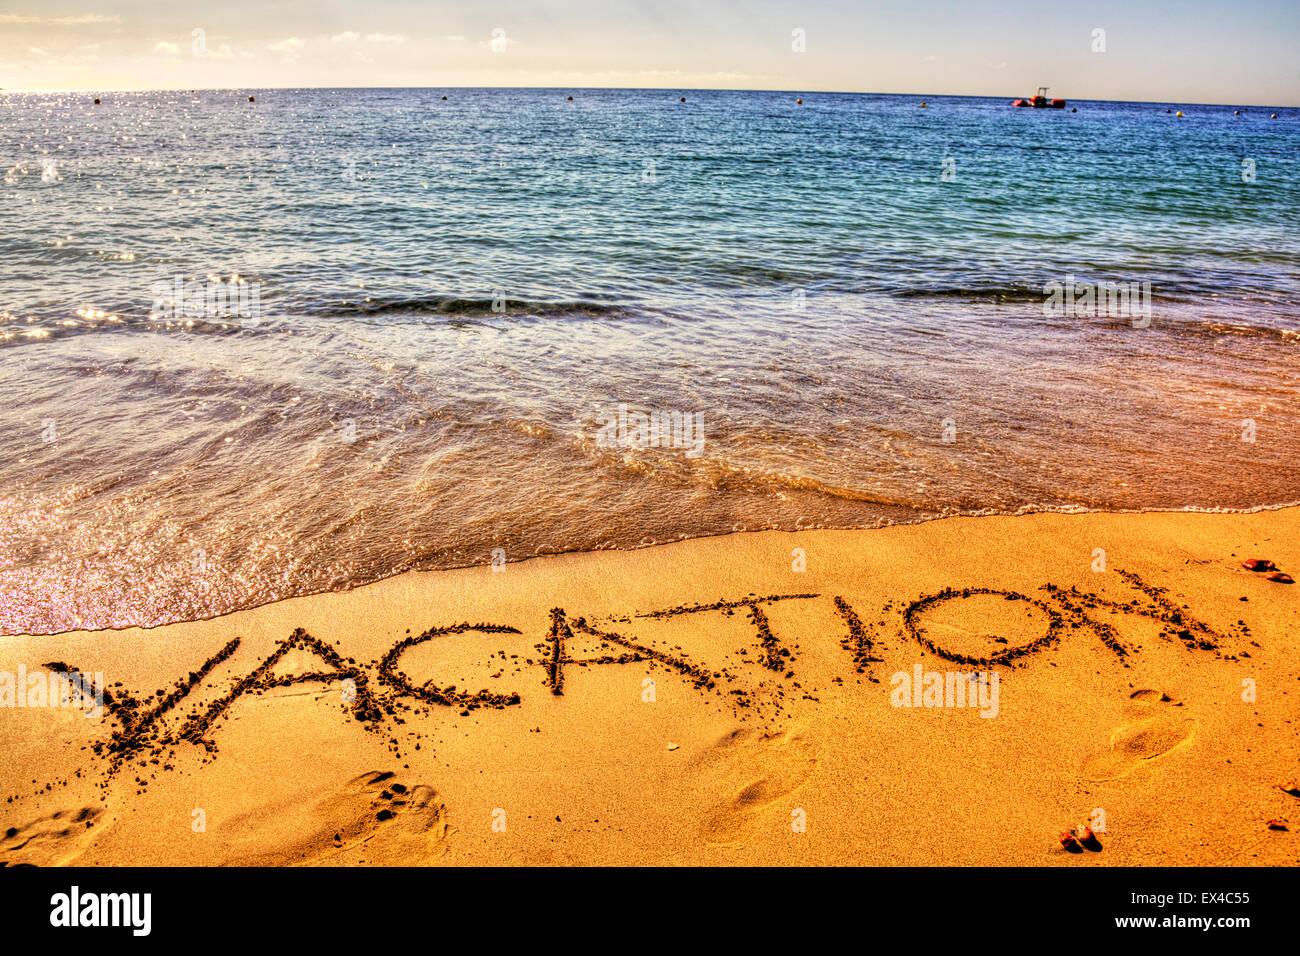 Vacation holiday word in sand written on beach resort sea coast coastline holidays vacations trips trip getaway - Stock Image